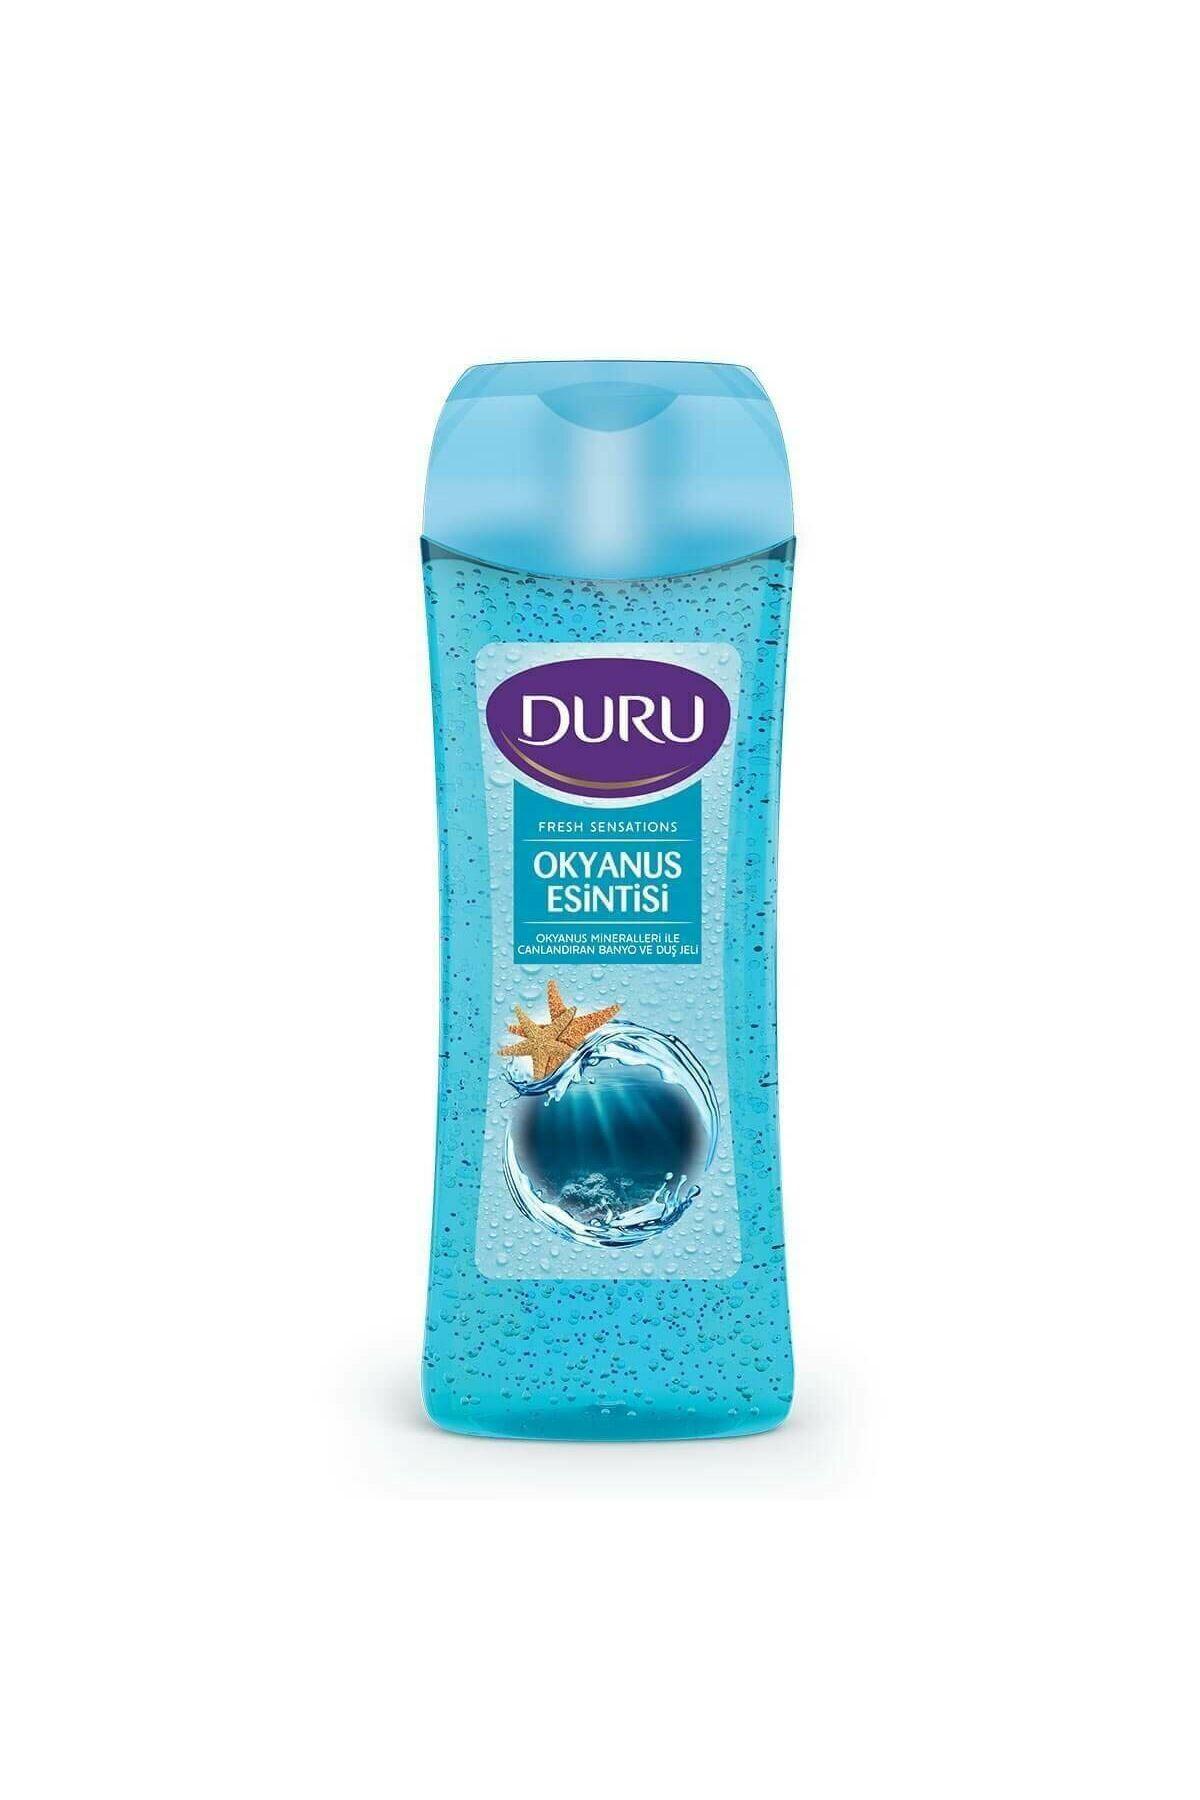 Duru Fresh Sensations Okyanus Esintisi Duş Jeli 450 ml